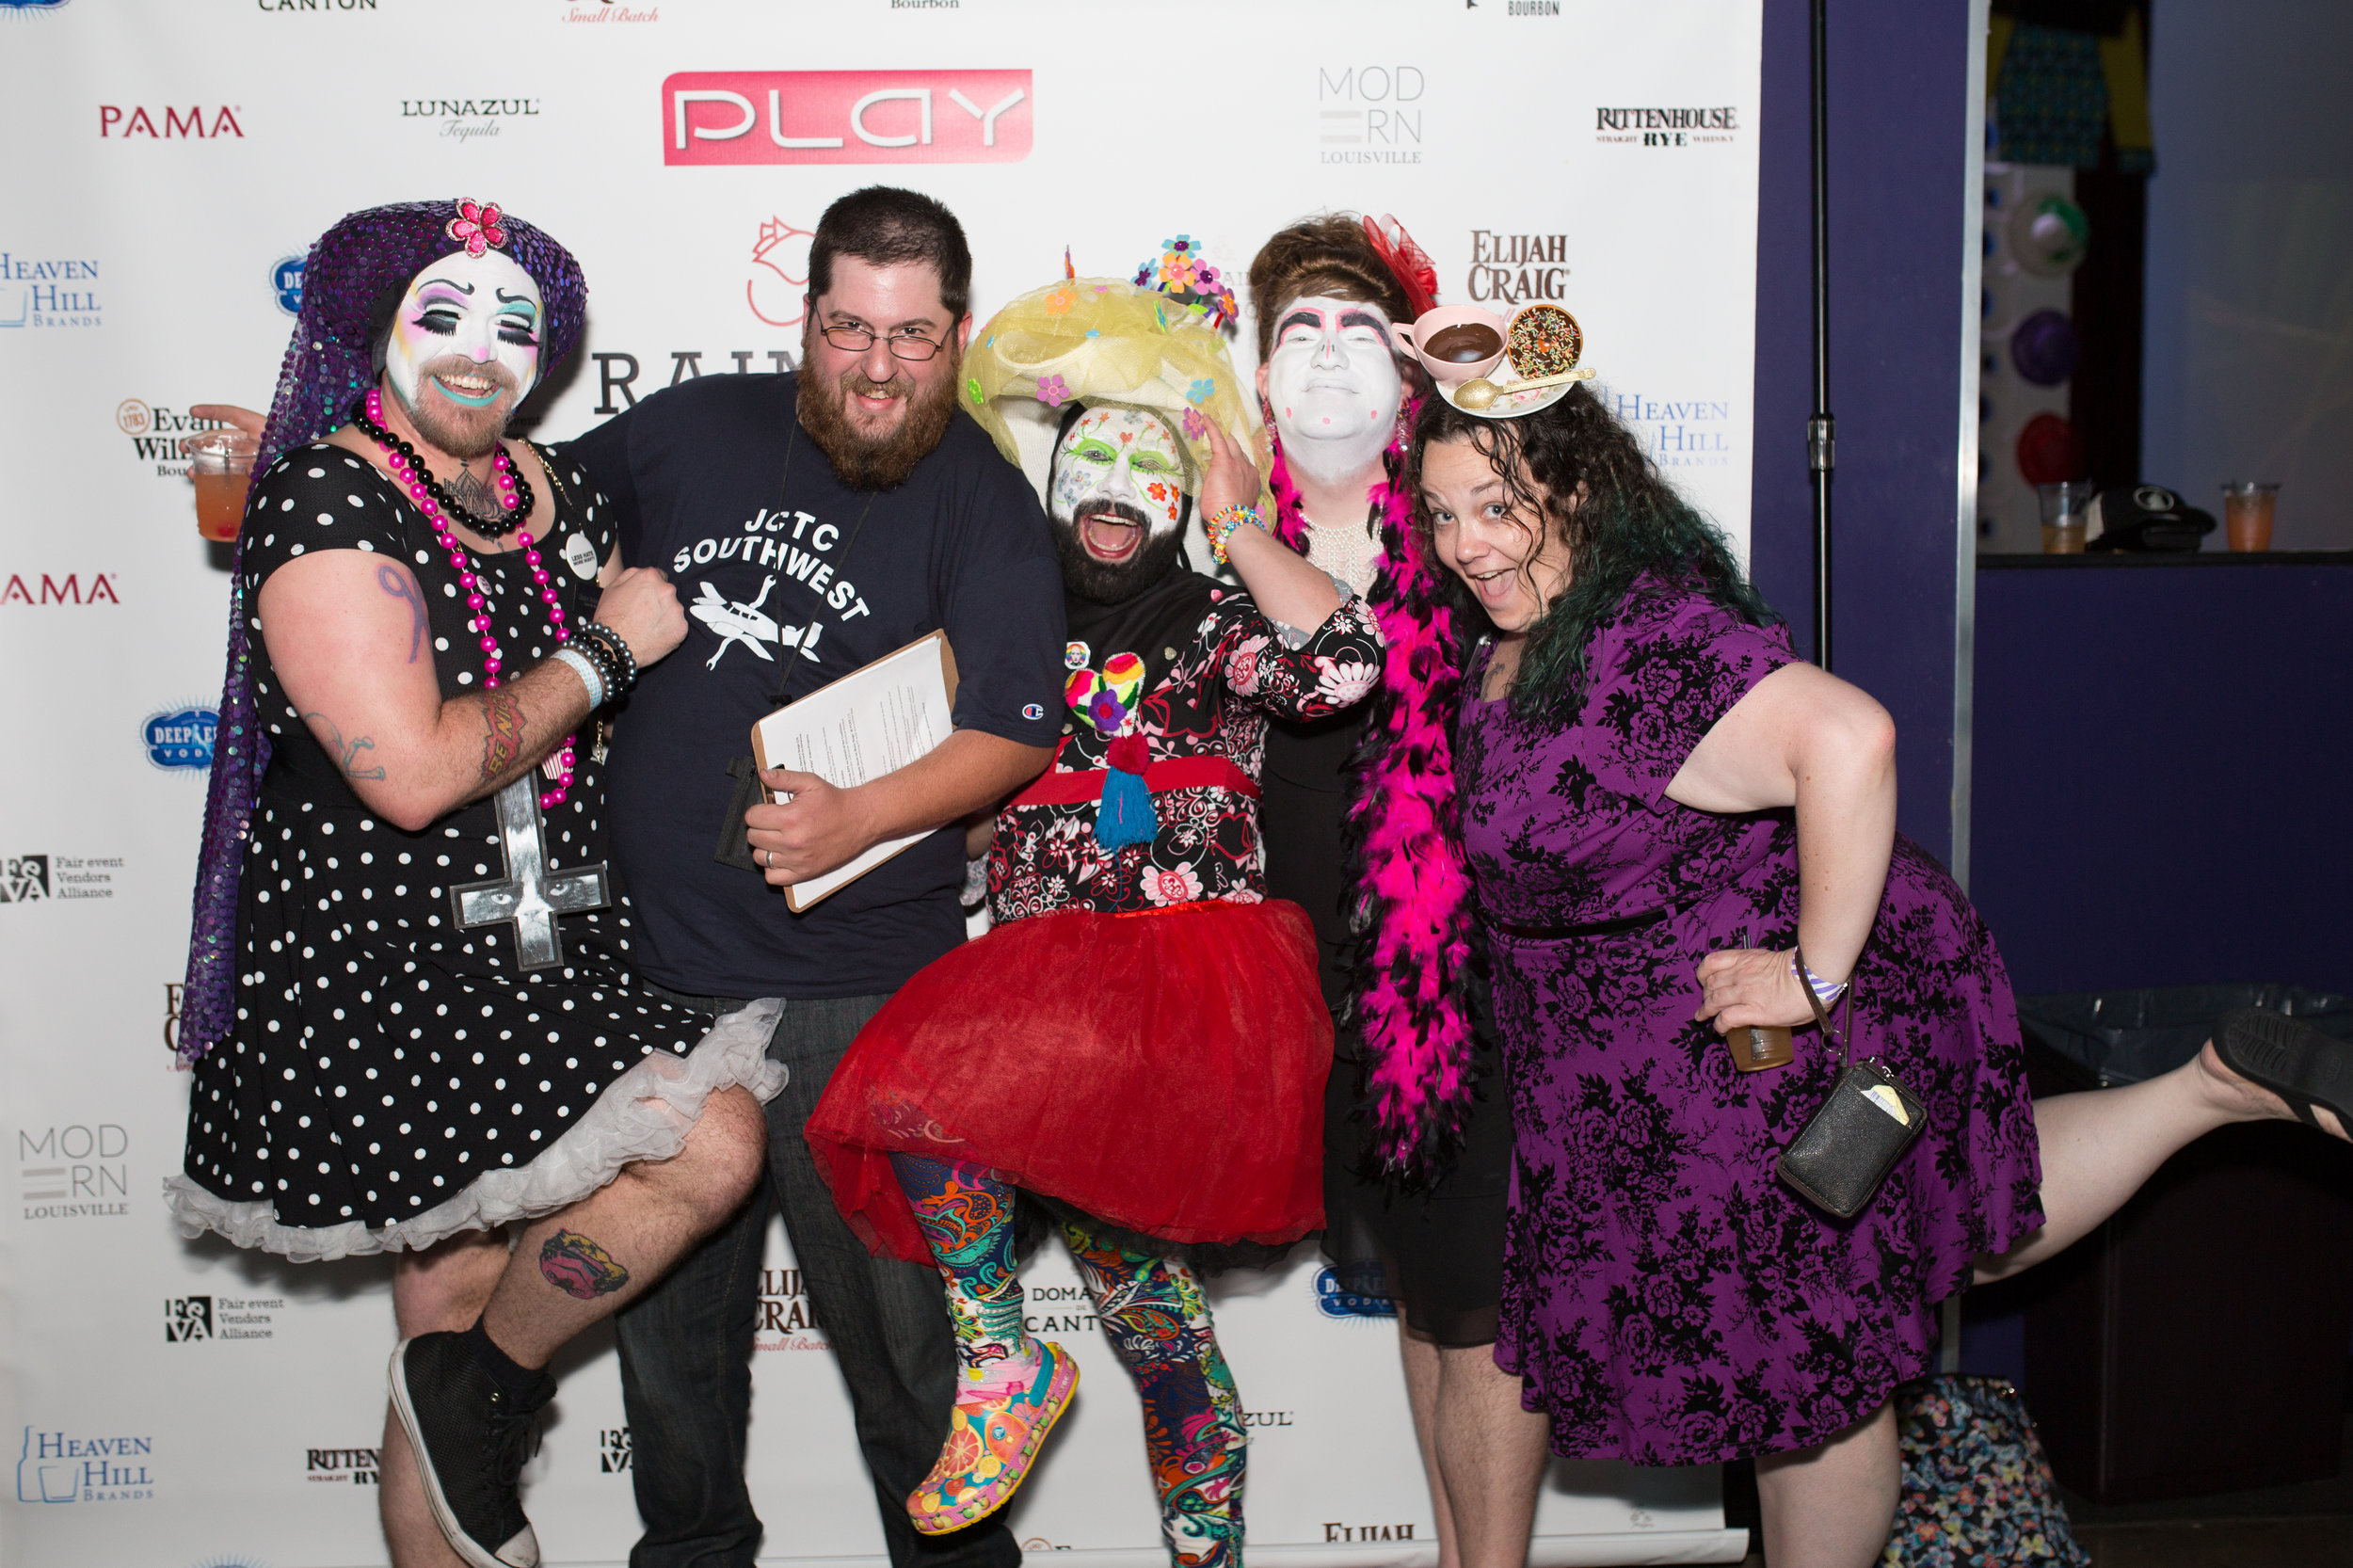 Rainbows & Roses Thurby 2017 WEBSITE FEVA PLAY Crystal Ludwick Photo 23.jpg